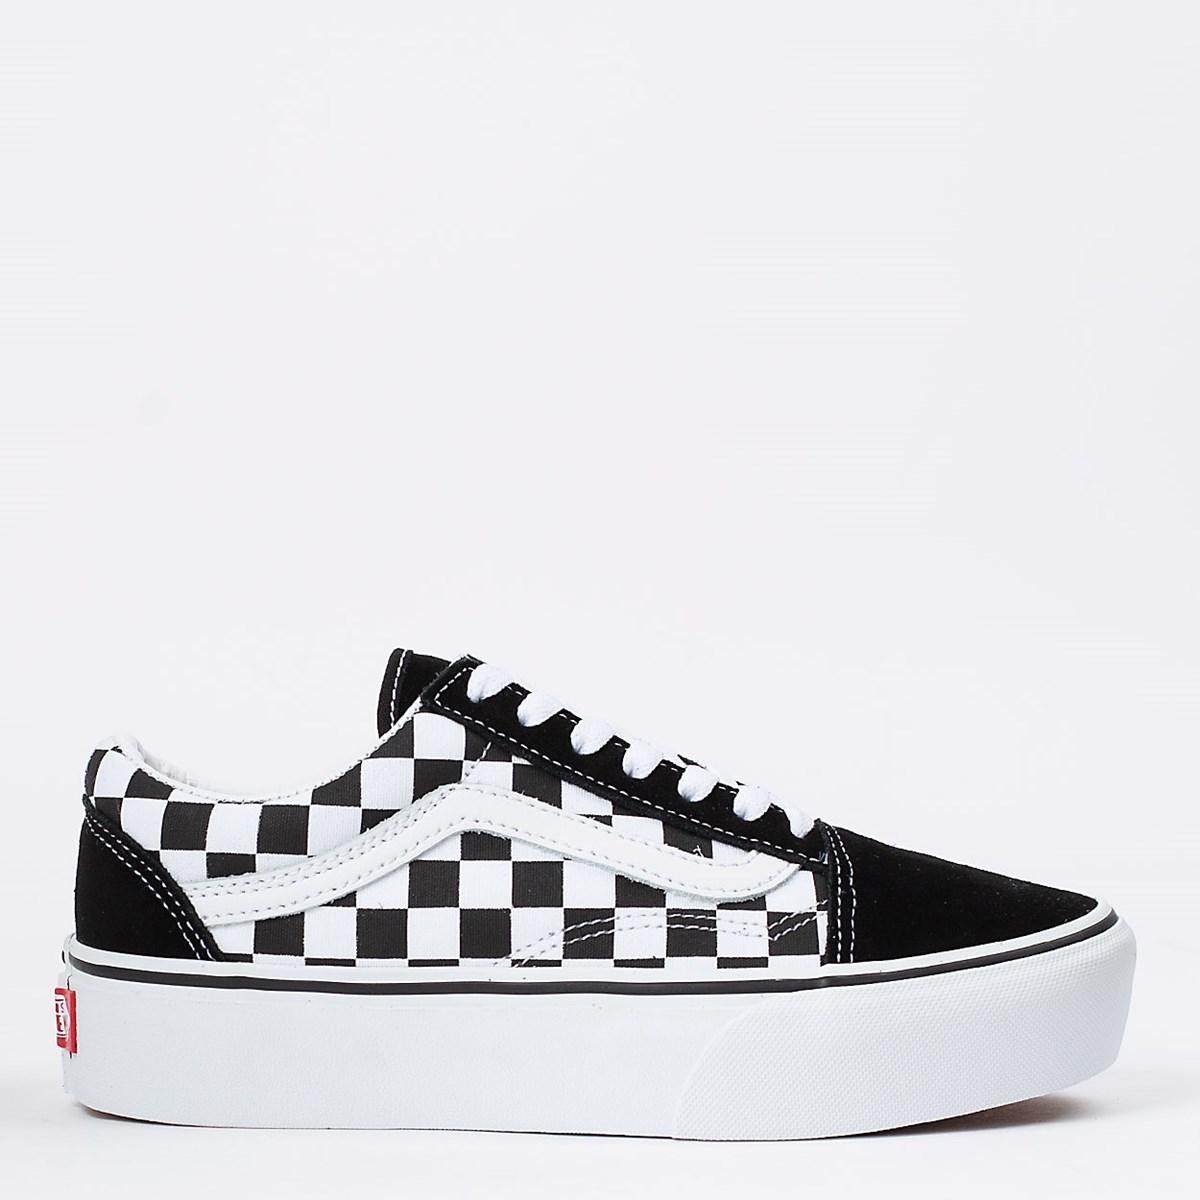 Tênis Vans Old Skool Platform Checkerboard Black True White VN0A3B3UHRK